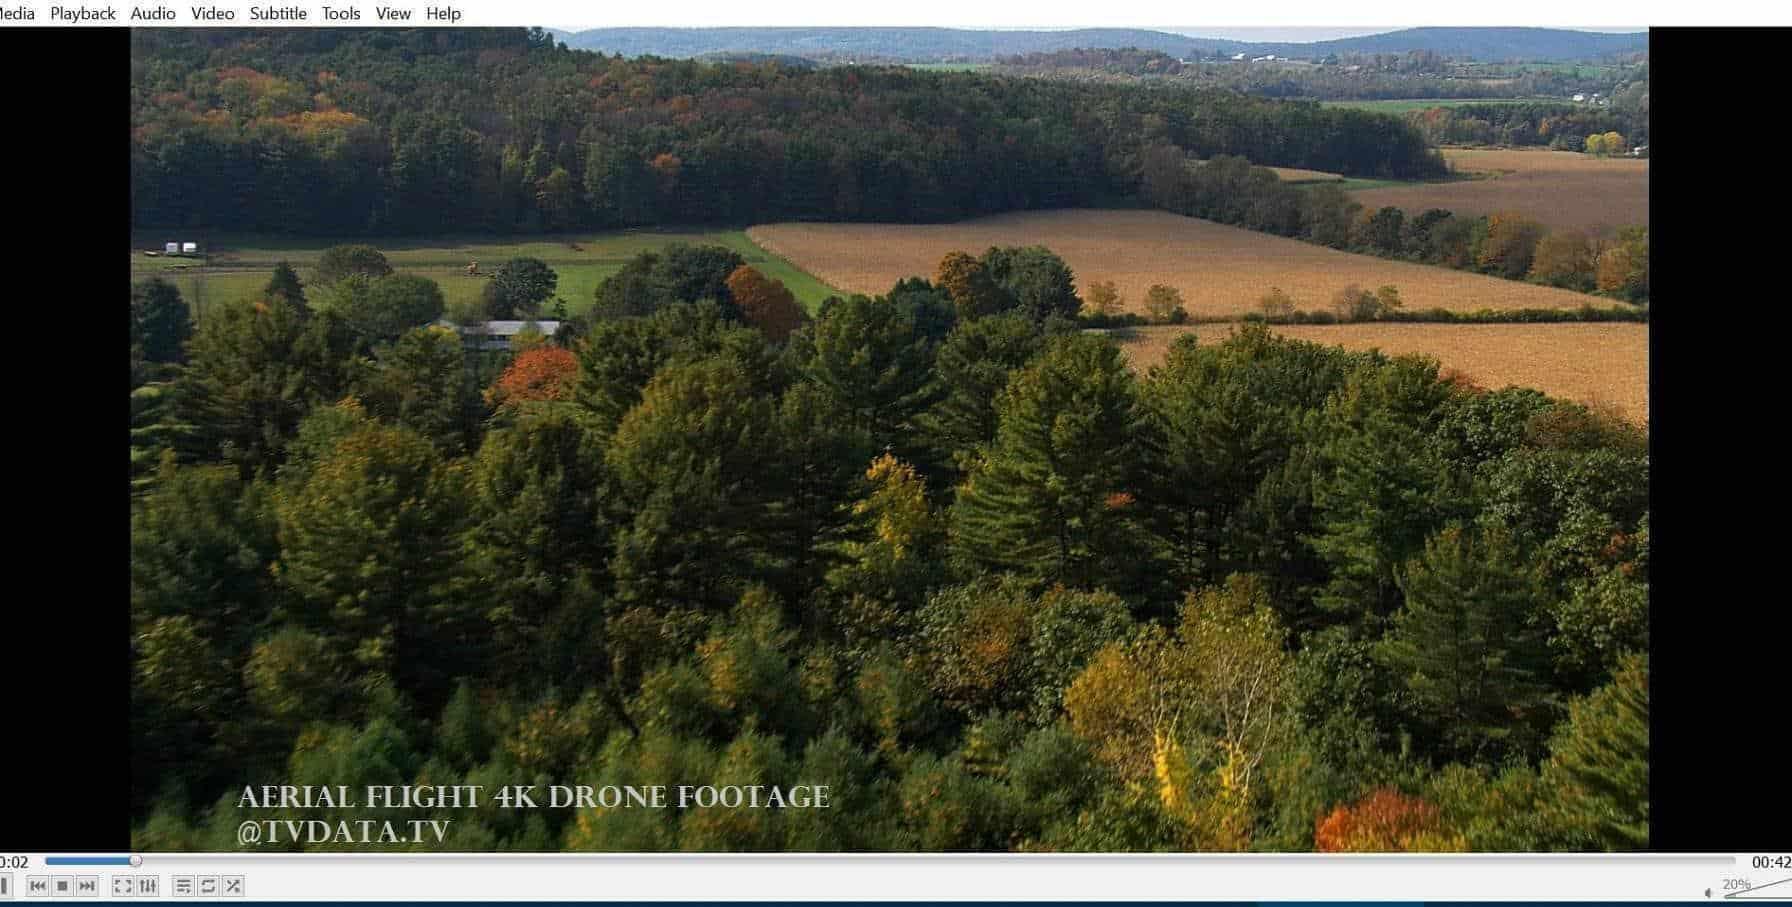 Aerial flight 4K Drone Footage